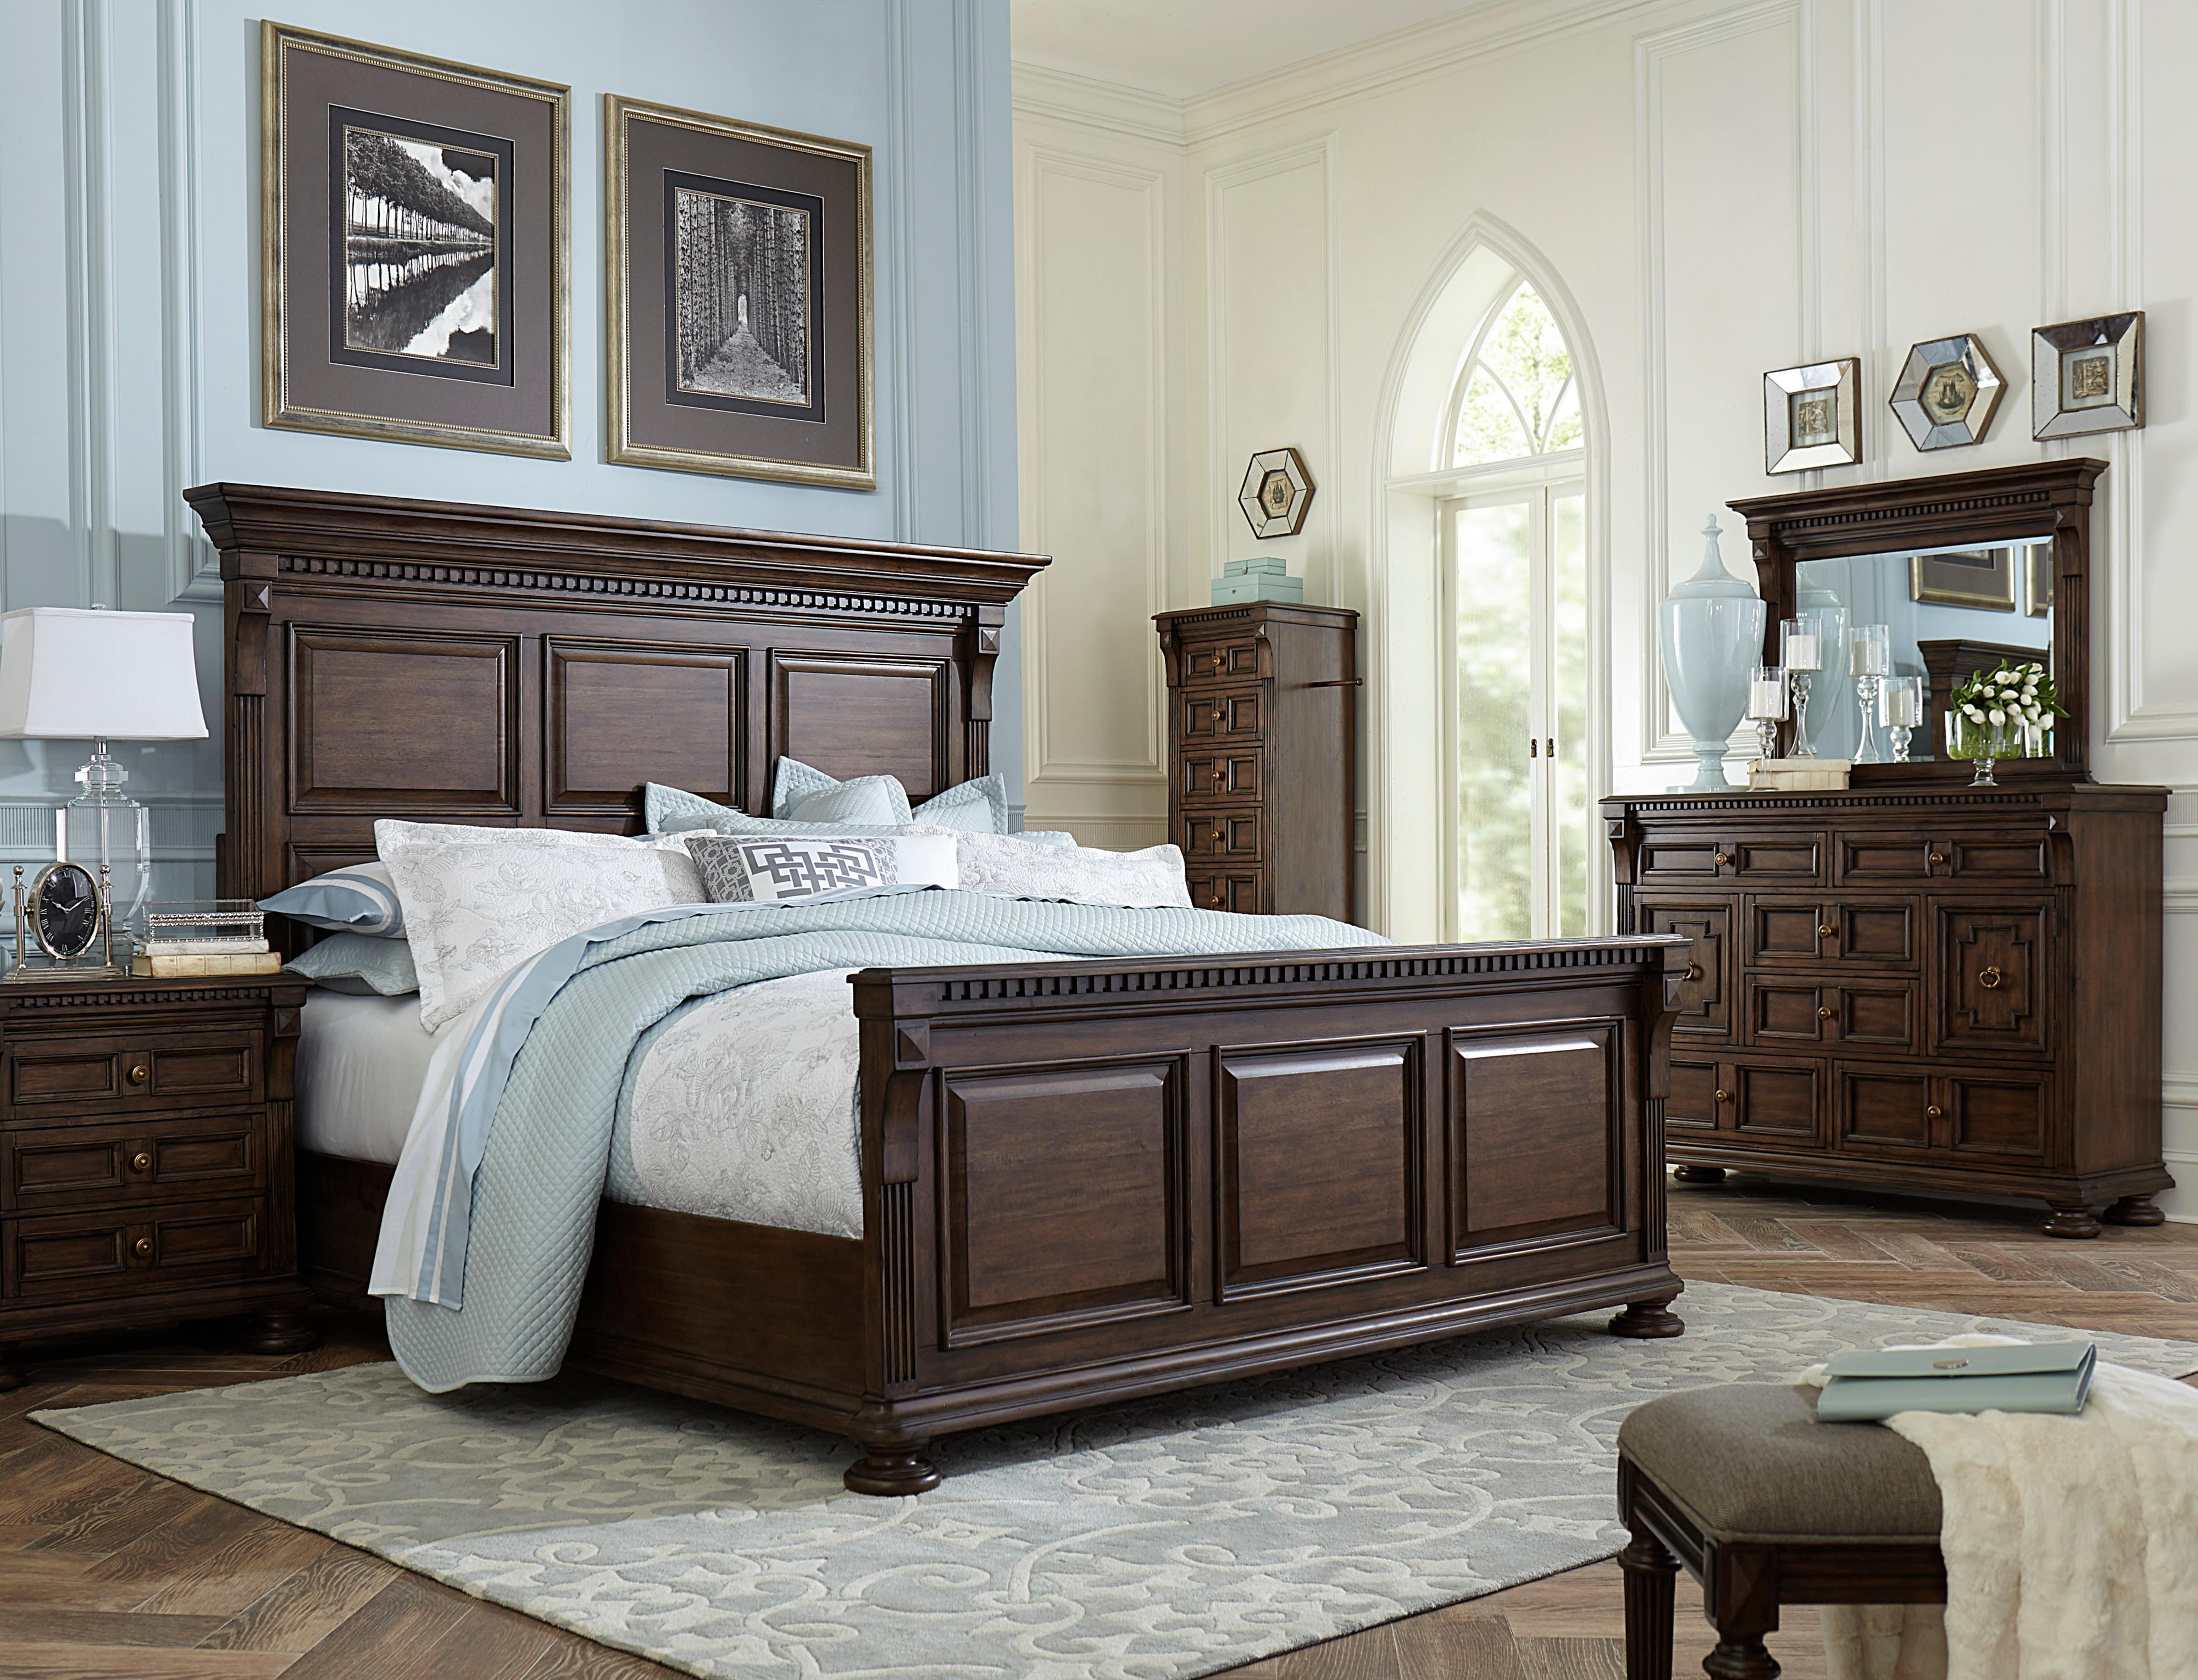 Broyhill Furniture Lyla California King Bedroom Group - Item Number: 4912 CK Bedroom Group 1